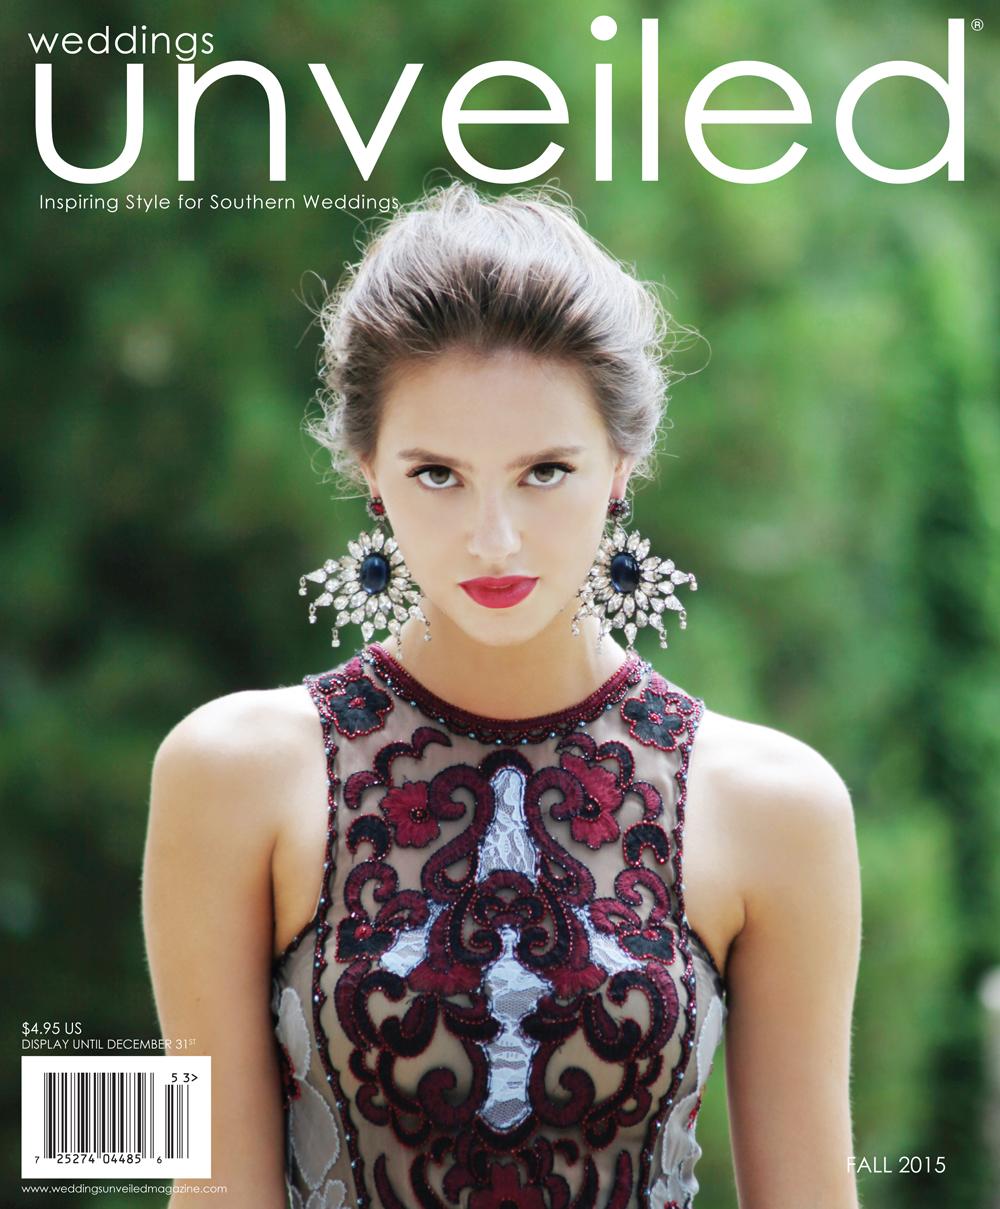 Weddings-Unveiled-Fall-2015-Cover.jpg